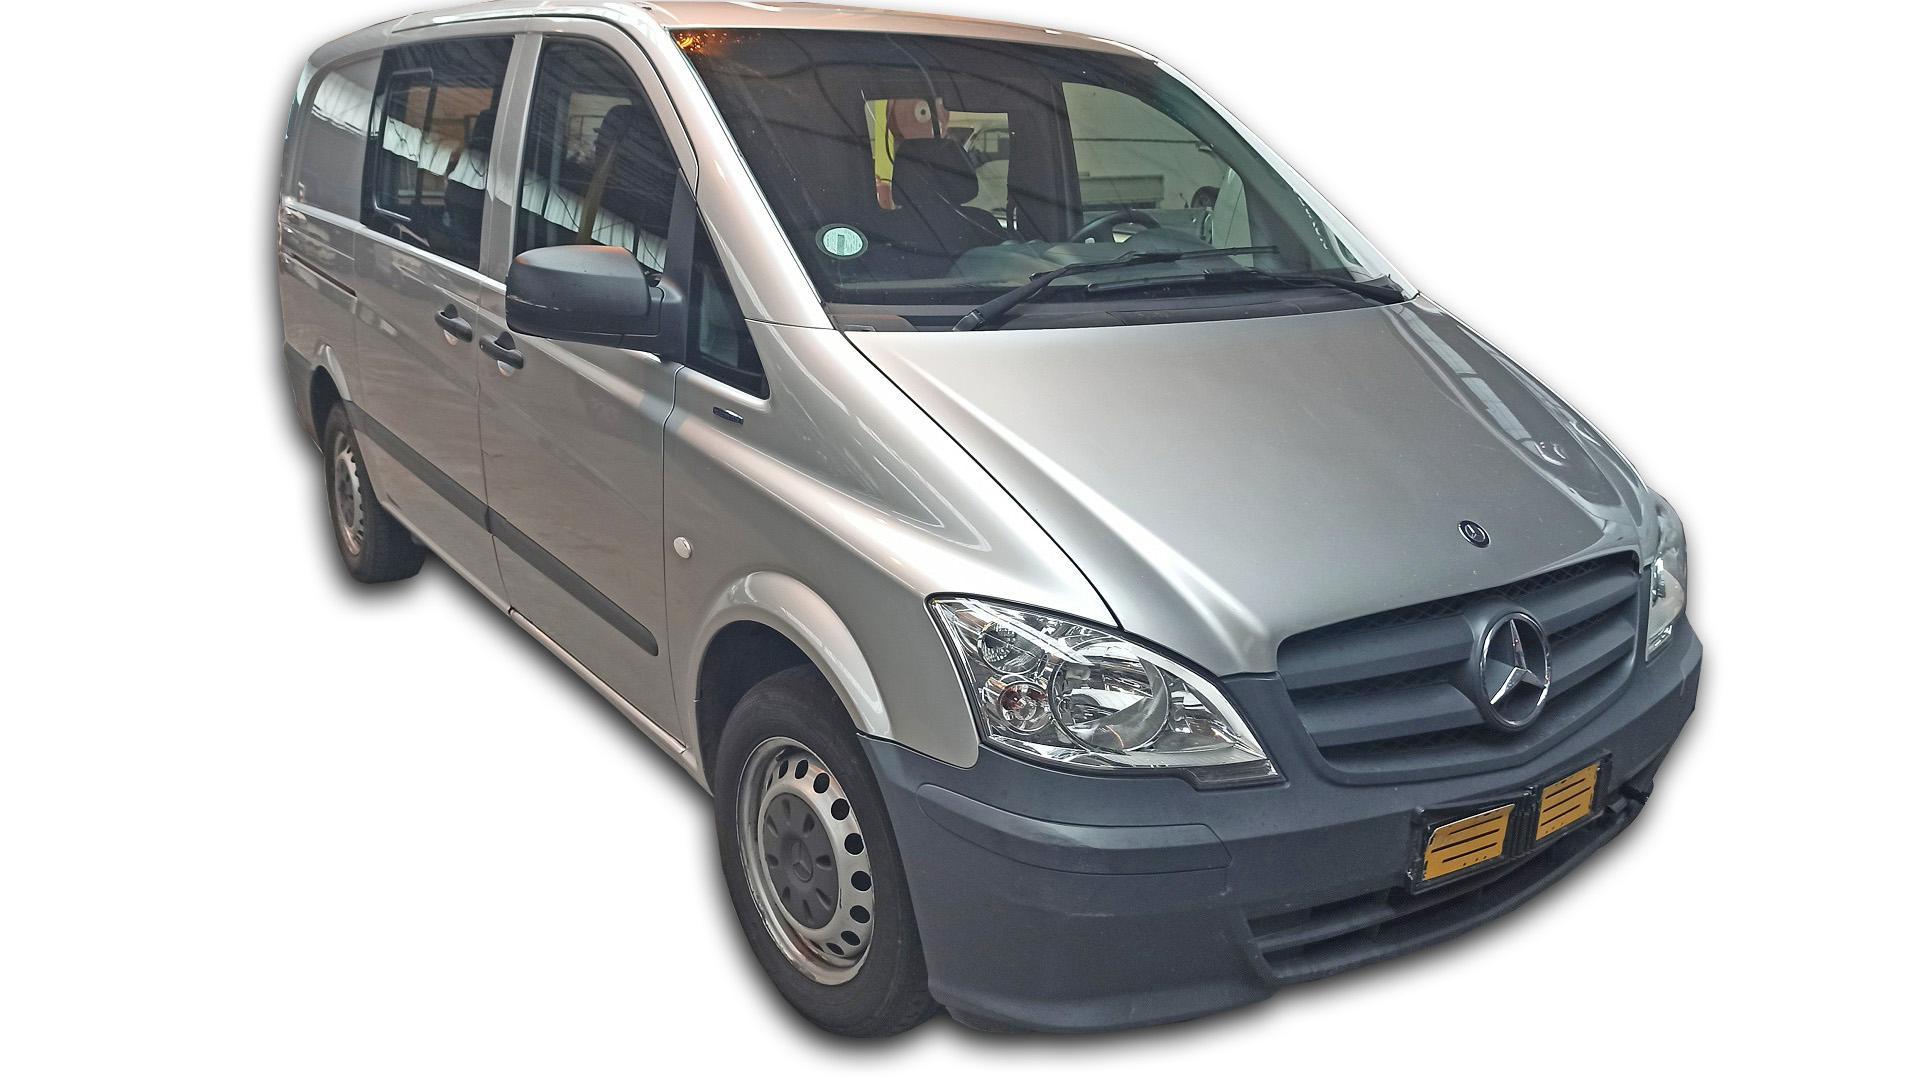 Mercedes Benz Mercede Benz Vito 116 Cdi Crew